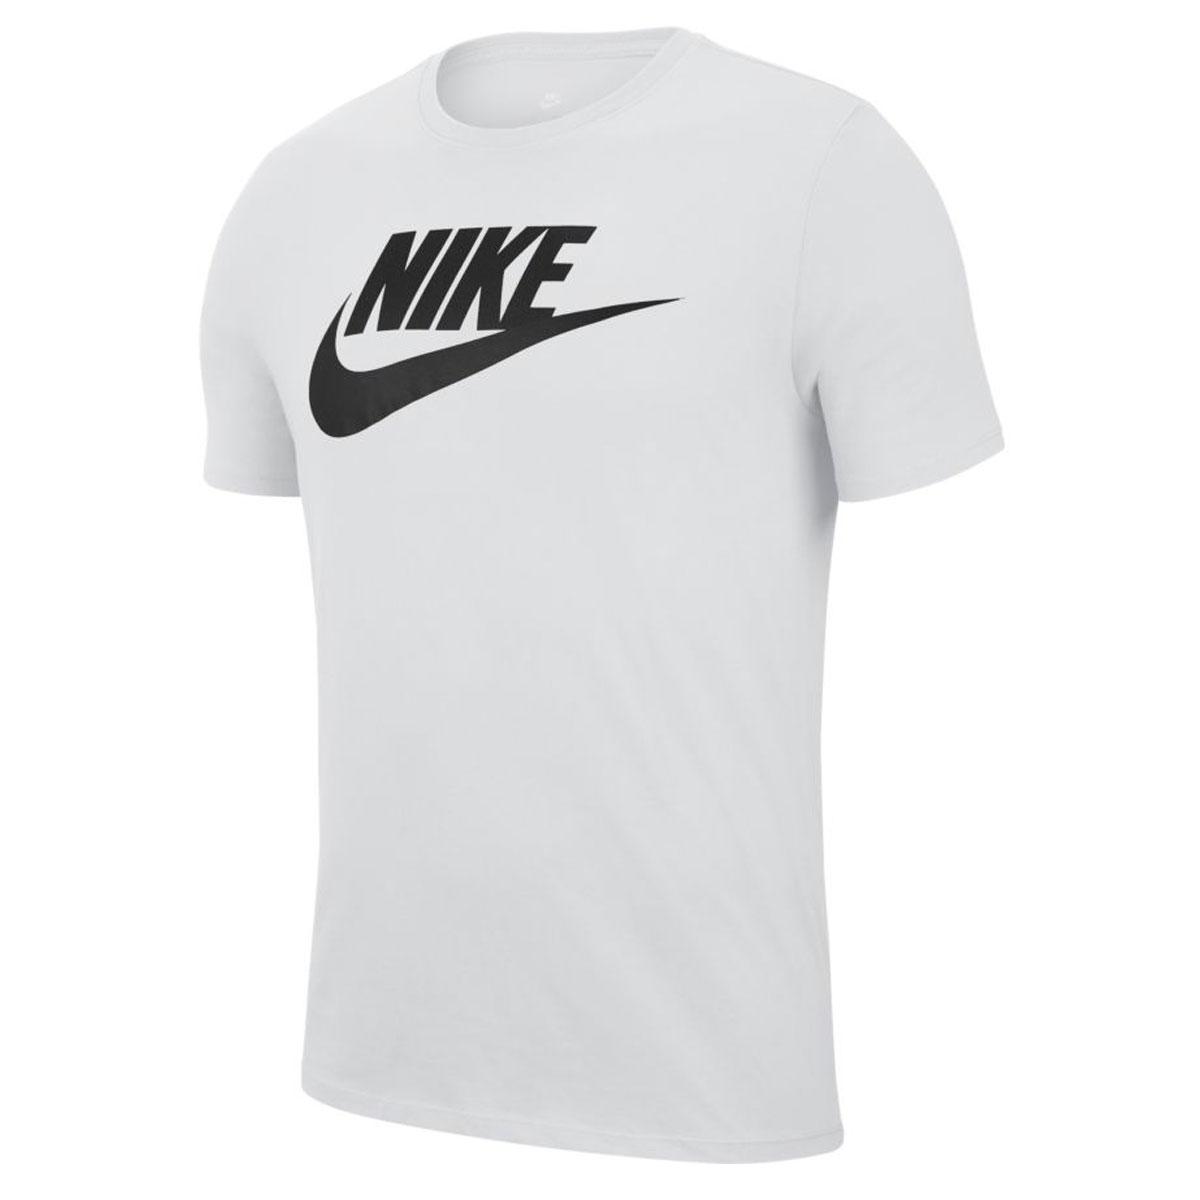 Shirt Sportpaleis Icon Bij Futura Online Nike Tee Kopen Wit 6vwBxqWd